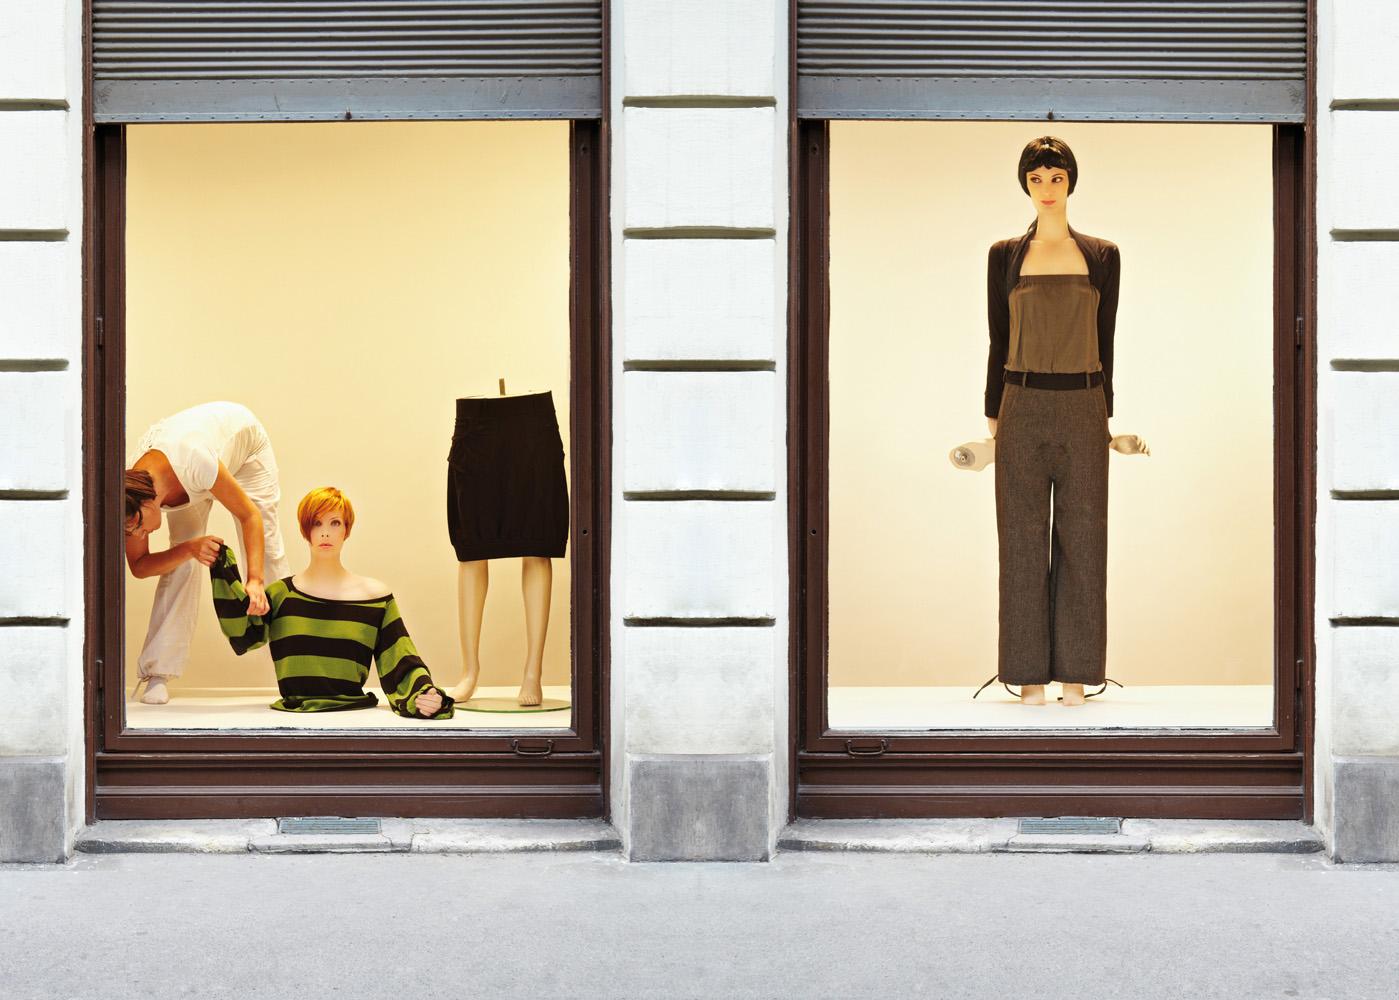 Maronski Image Campagne